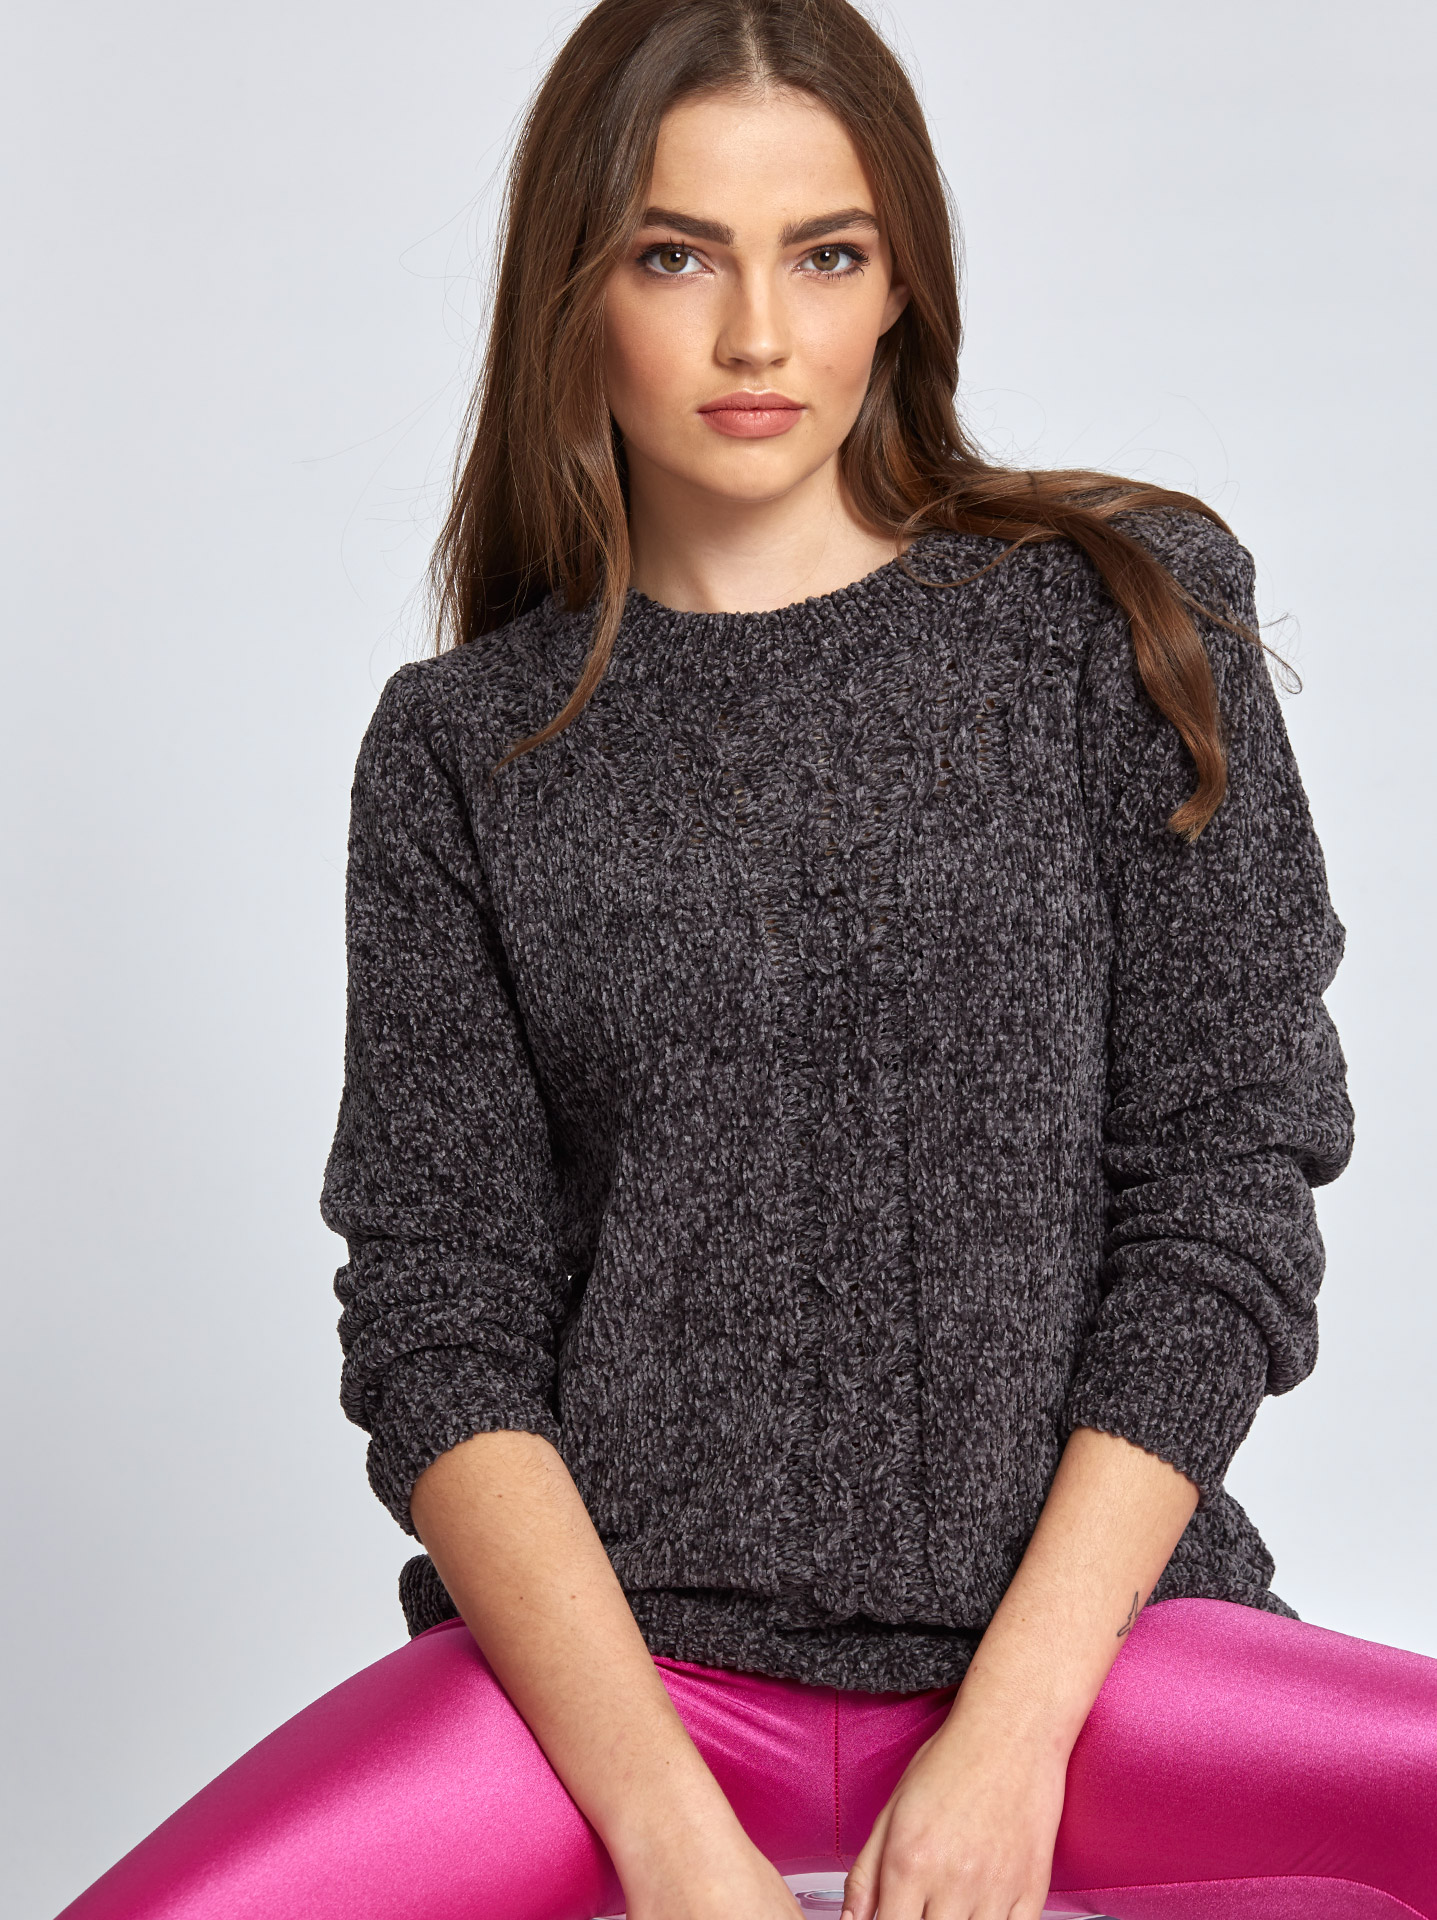 eaafbaa413a6 Chenille πουλόβερ με σχέδιο γκρι σκουρο